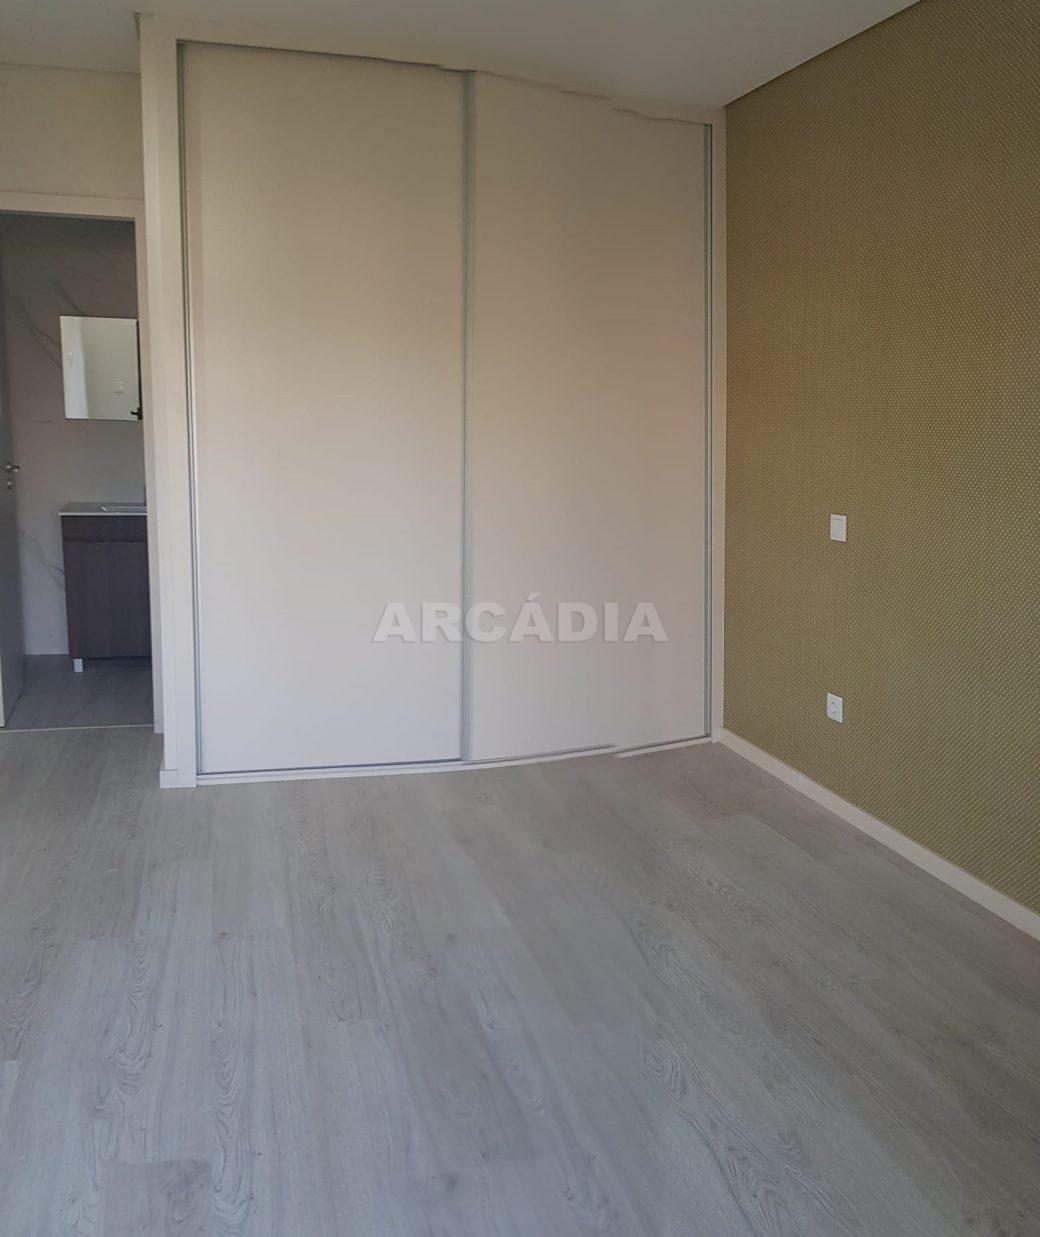 arcadia-imobiliaria-braga-apartamento-tipo-3-arrendamento-sao-lazaro-remodelado-excelente-preco-unica-oportunidade8